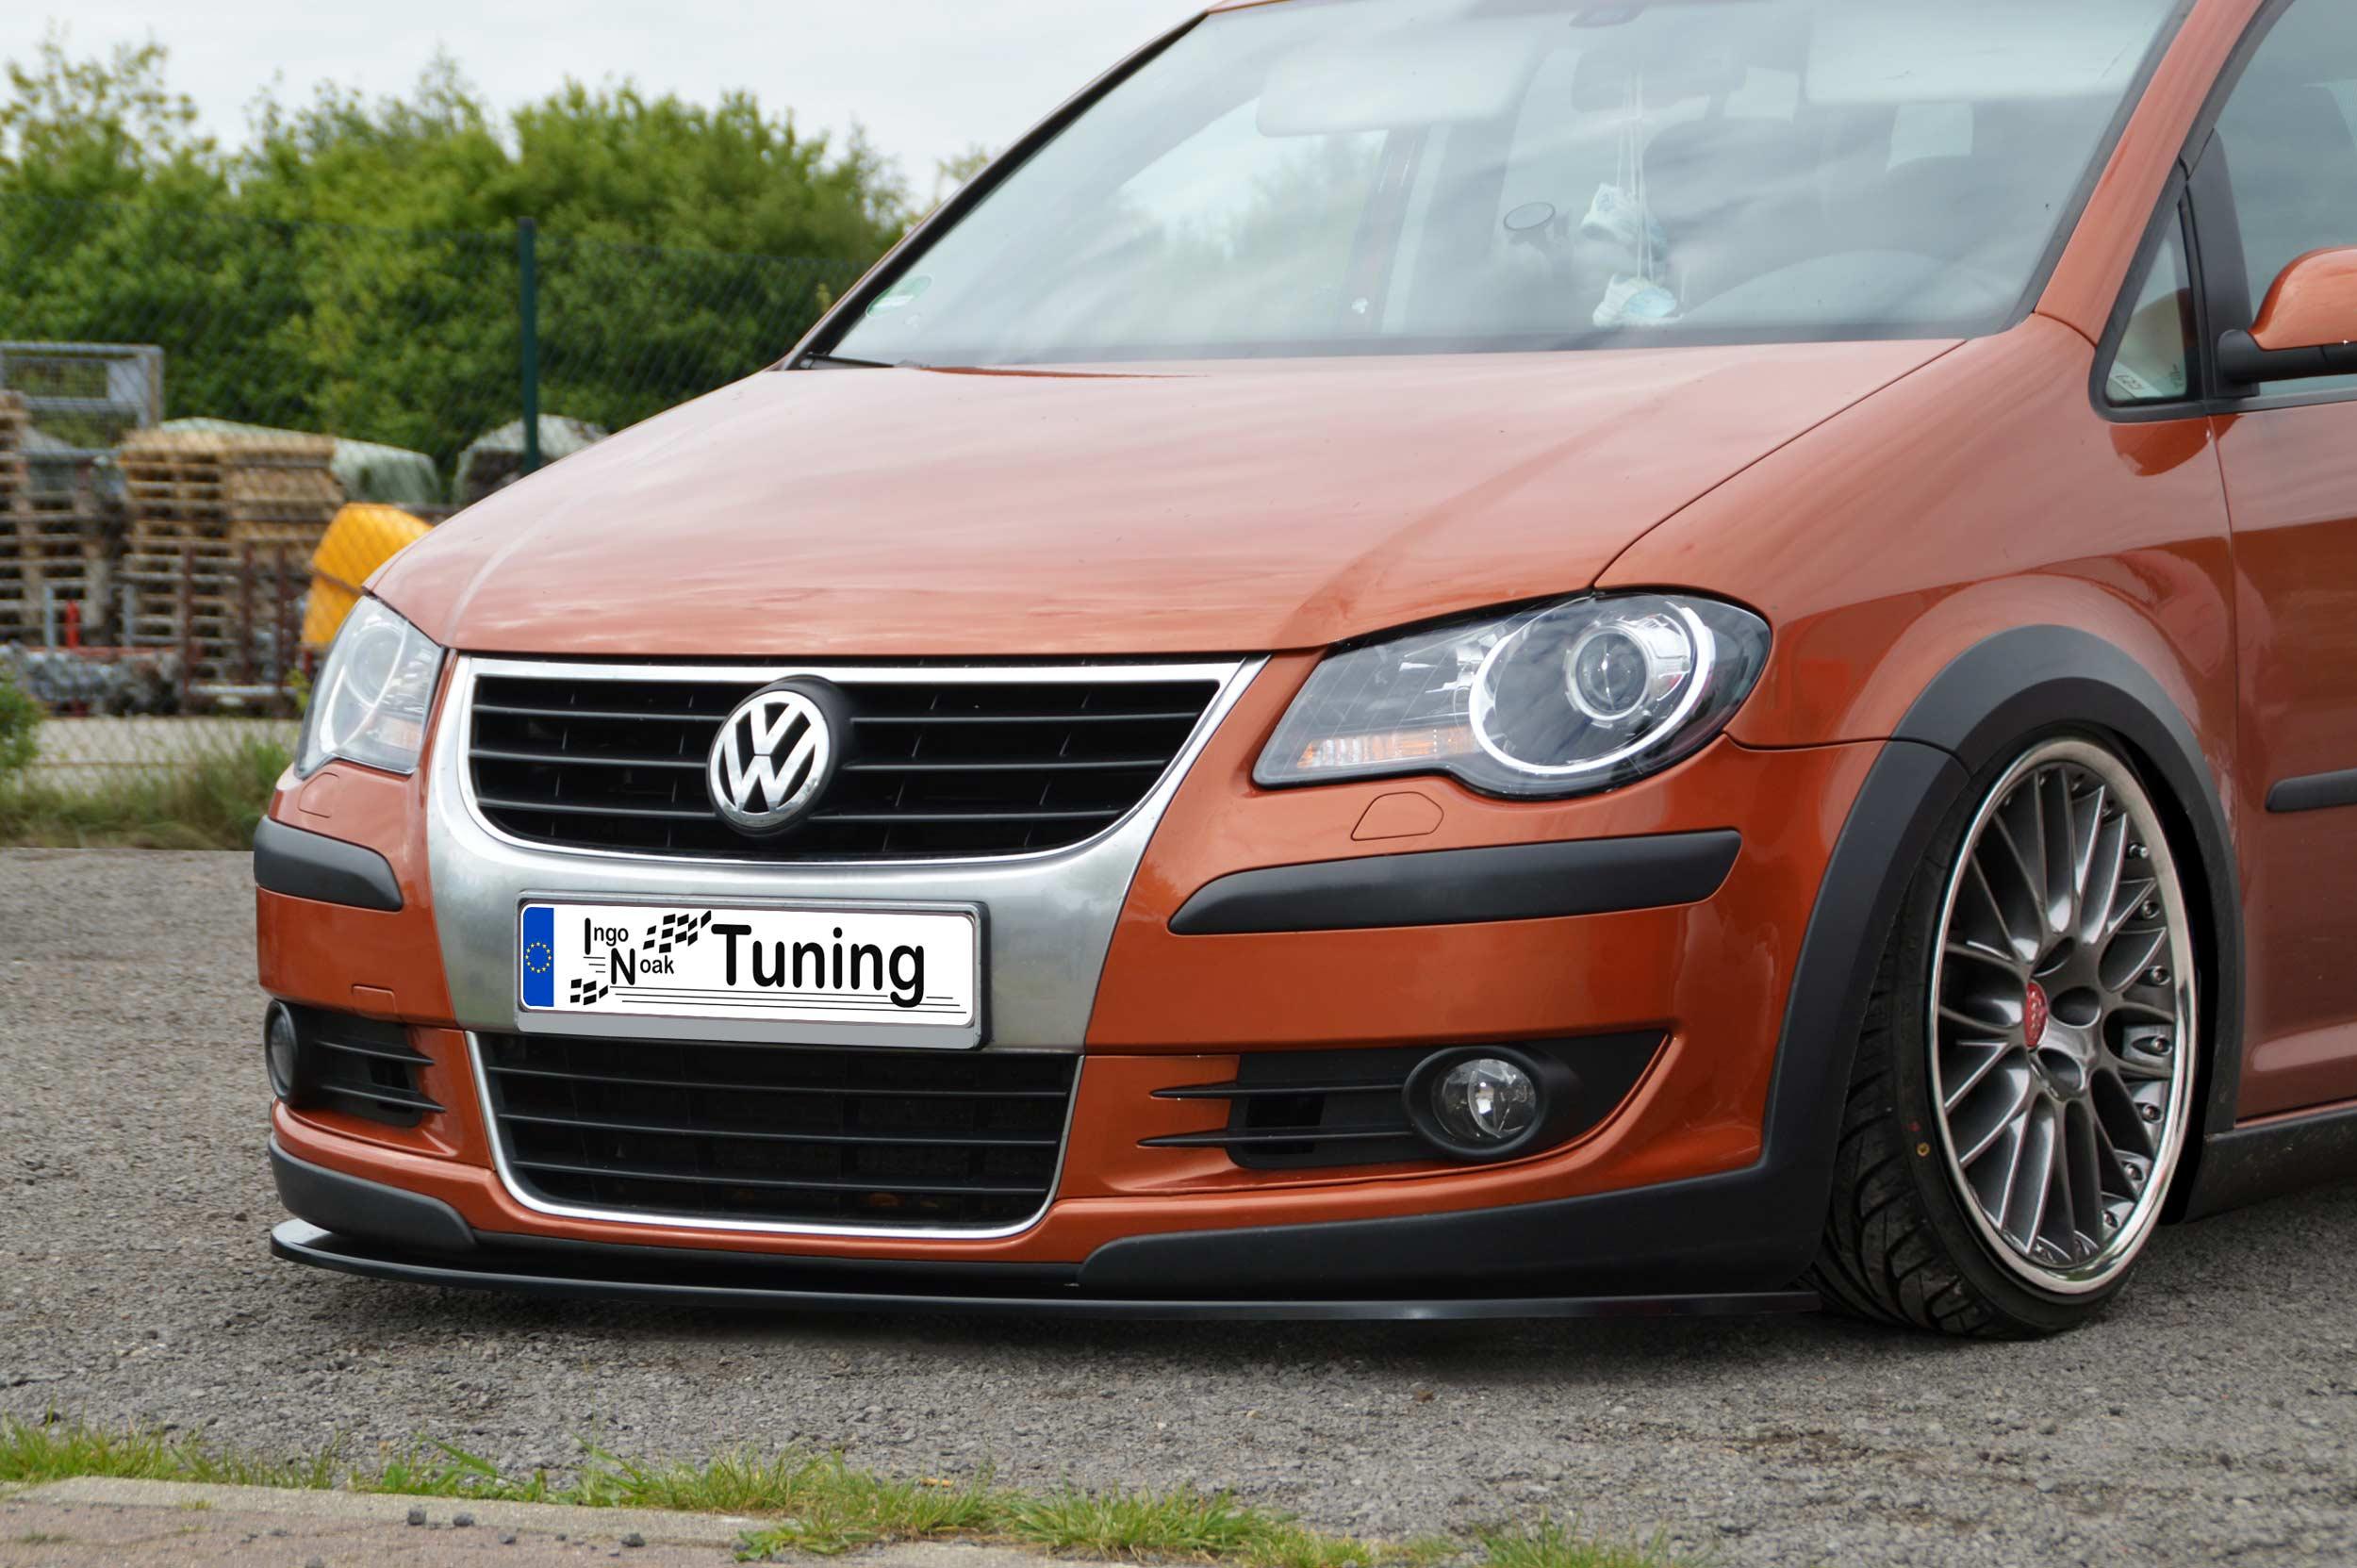 Front Ansatz Spoiler Schwert Diffusor Lippe Tuning für VW Touran FA045